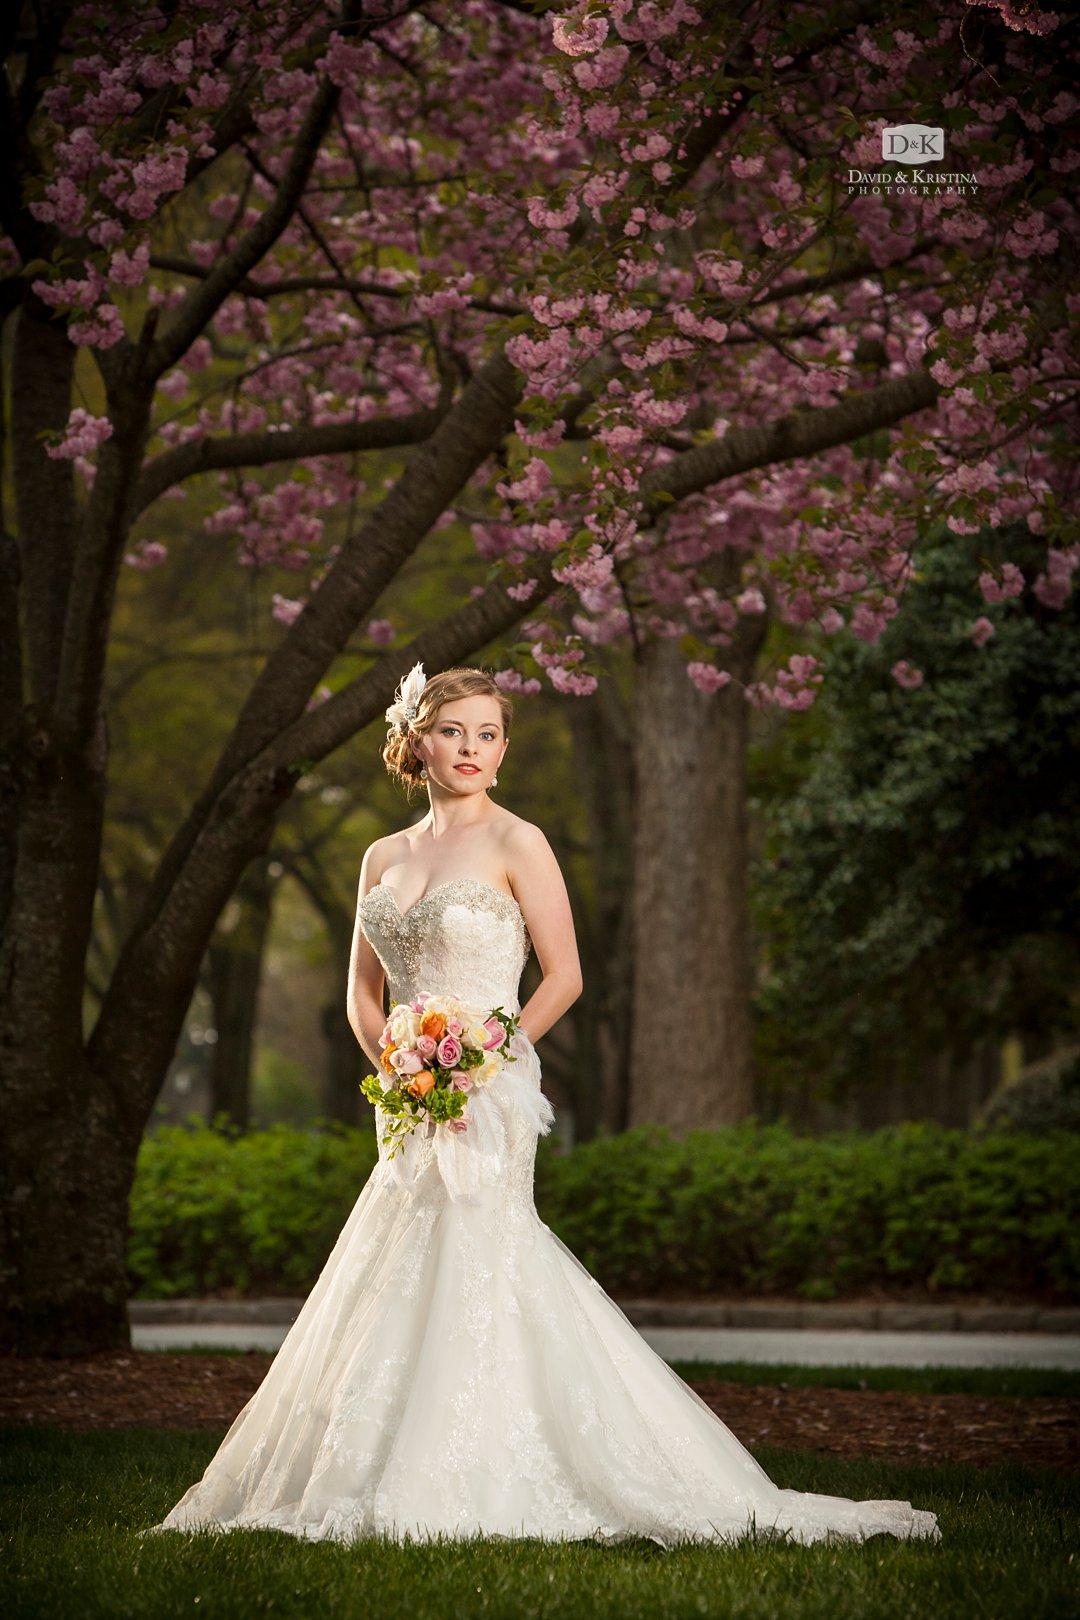 Furman bridal portrait in the Spring